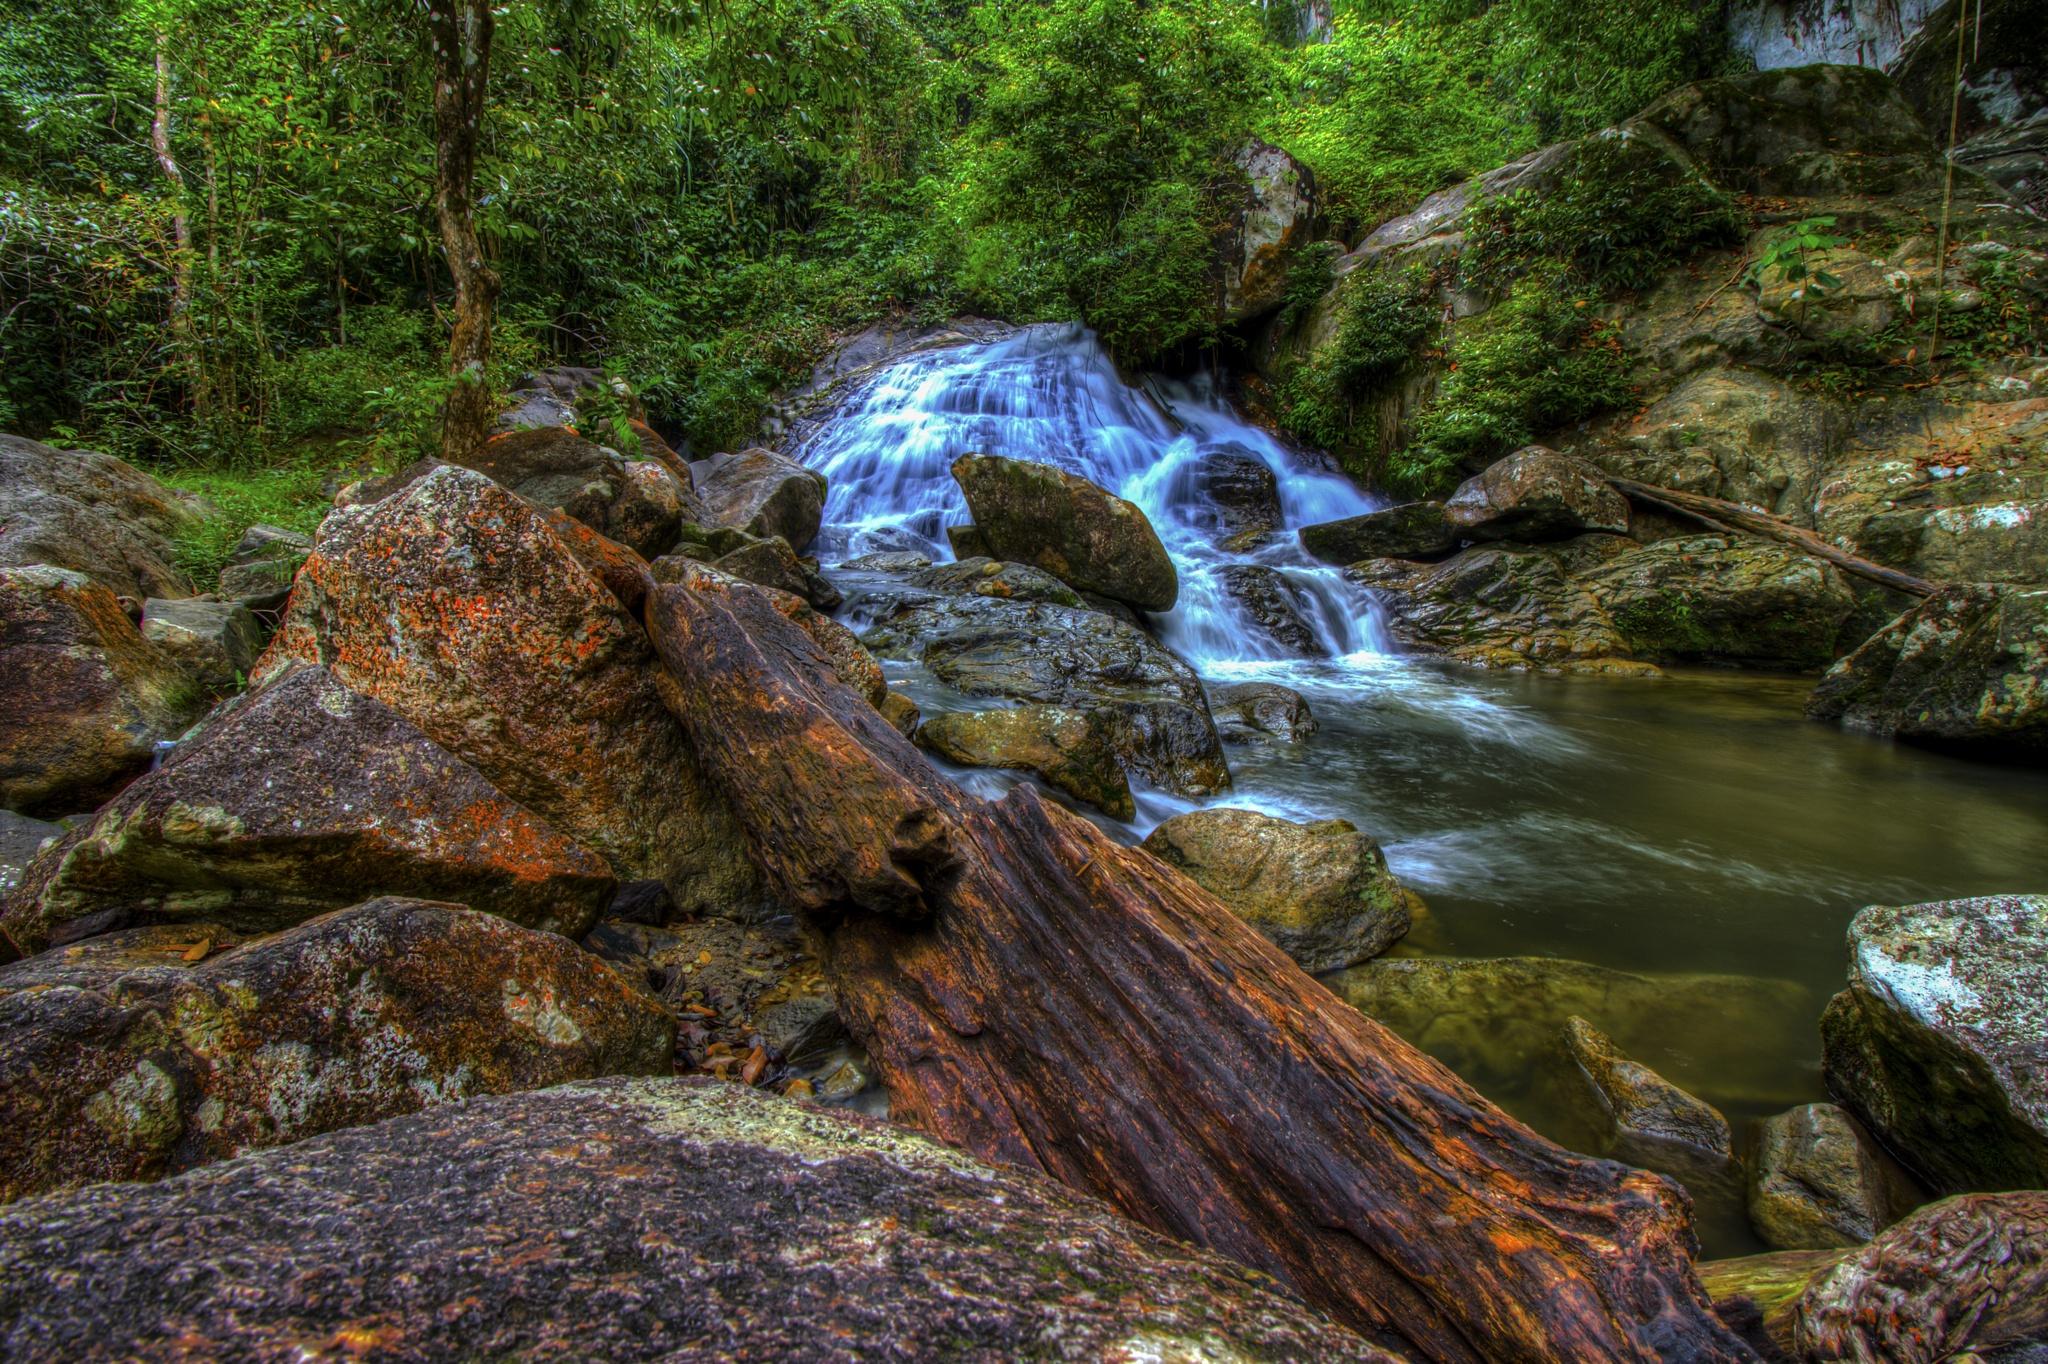 flowing water by Germzki Hitch Cardenas